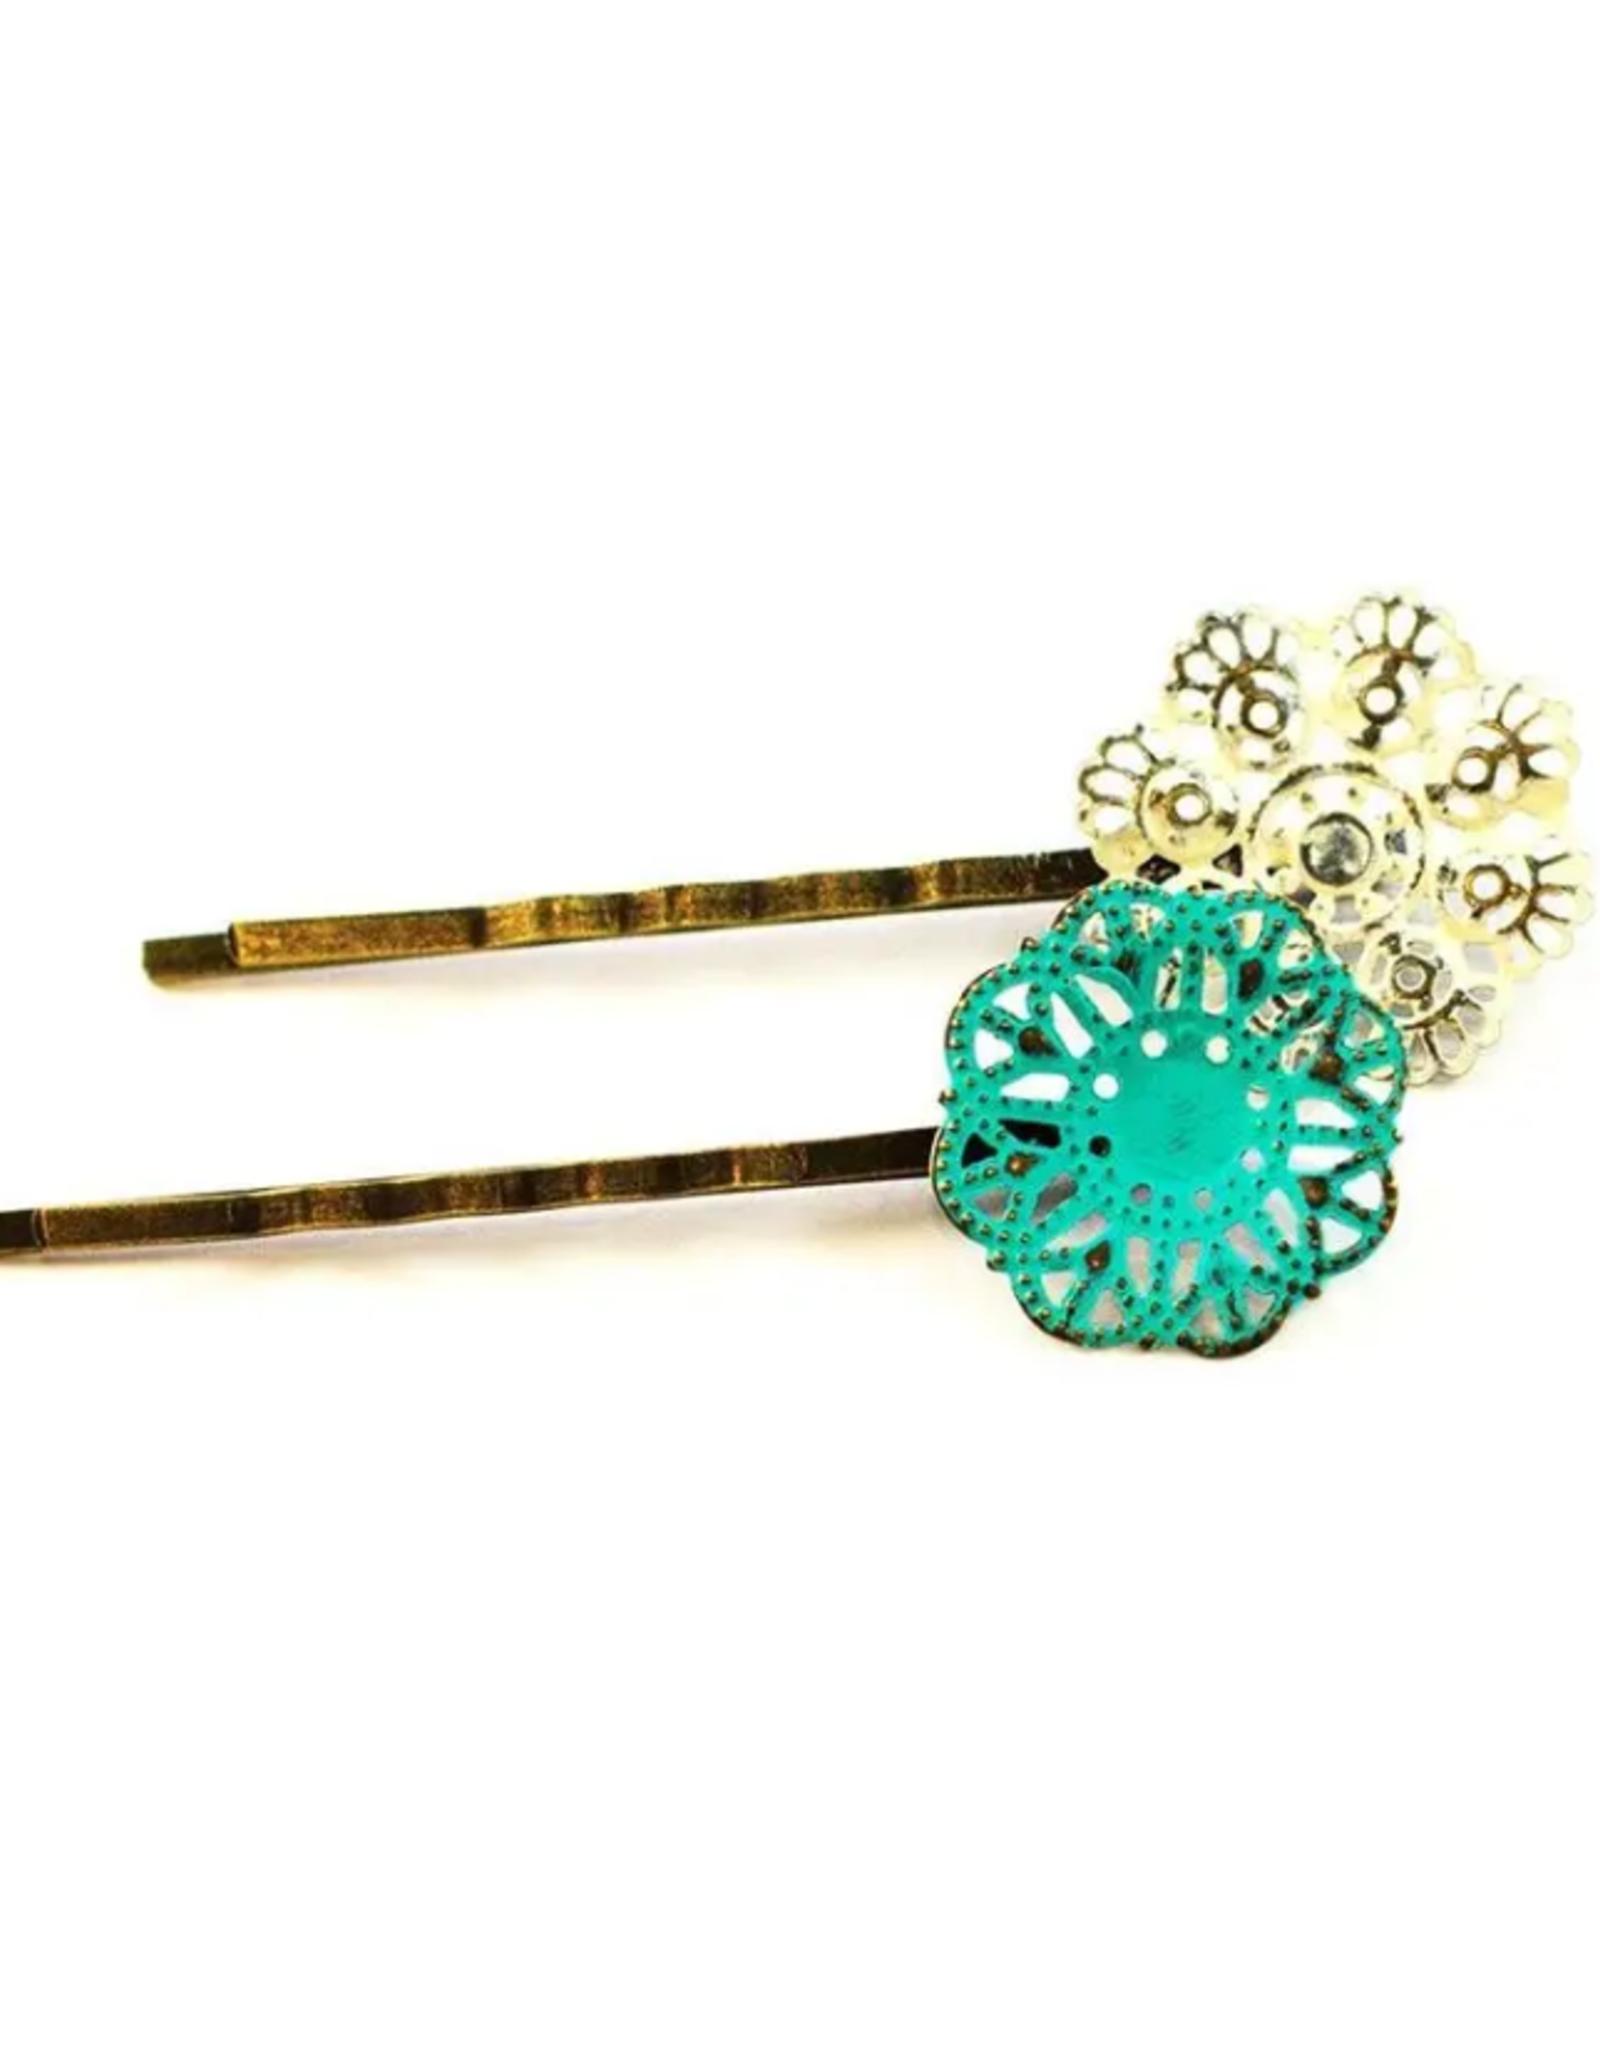 Gleeful Peacock Doily bobby pins (Turquoise & Vanilla)